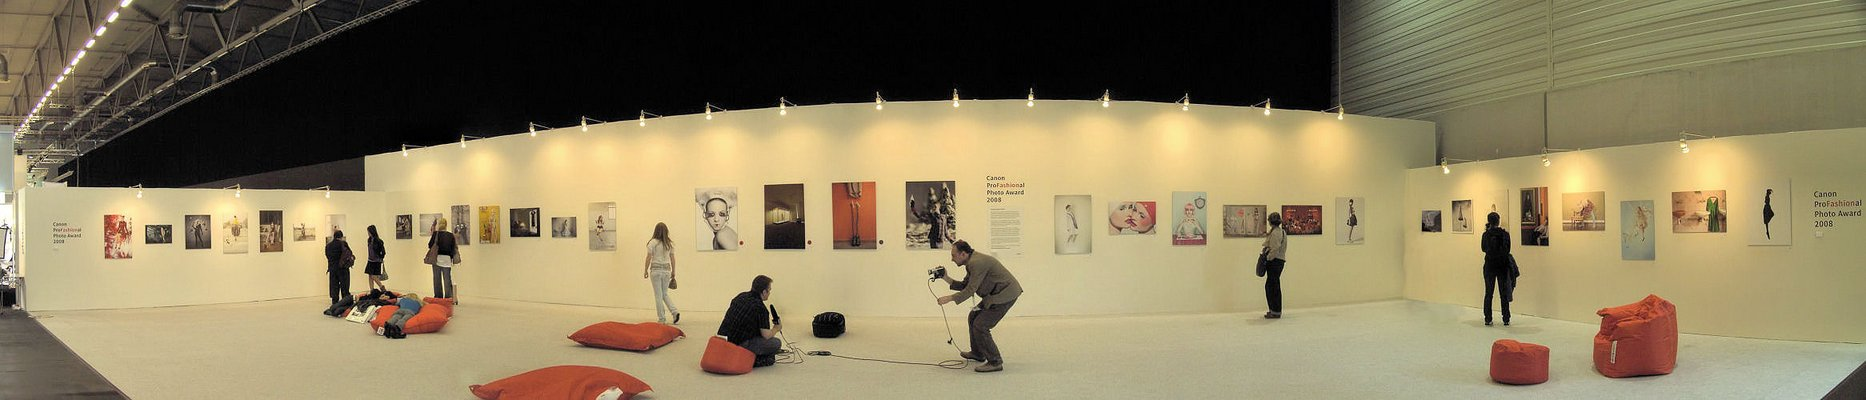 .......... Canon Photo Award 2008.....oder Relaxflächen..........!